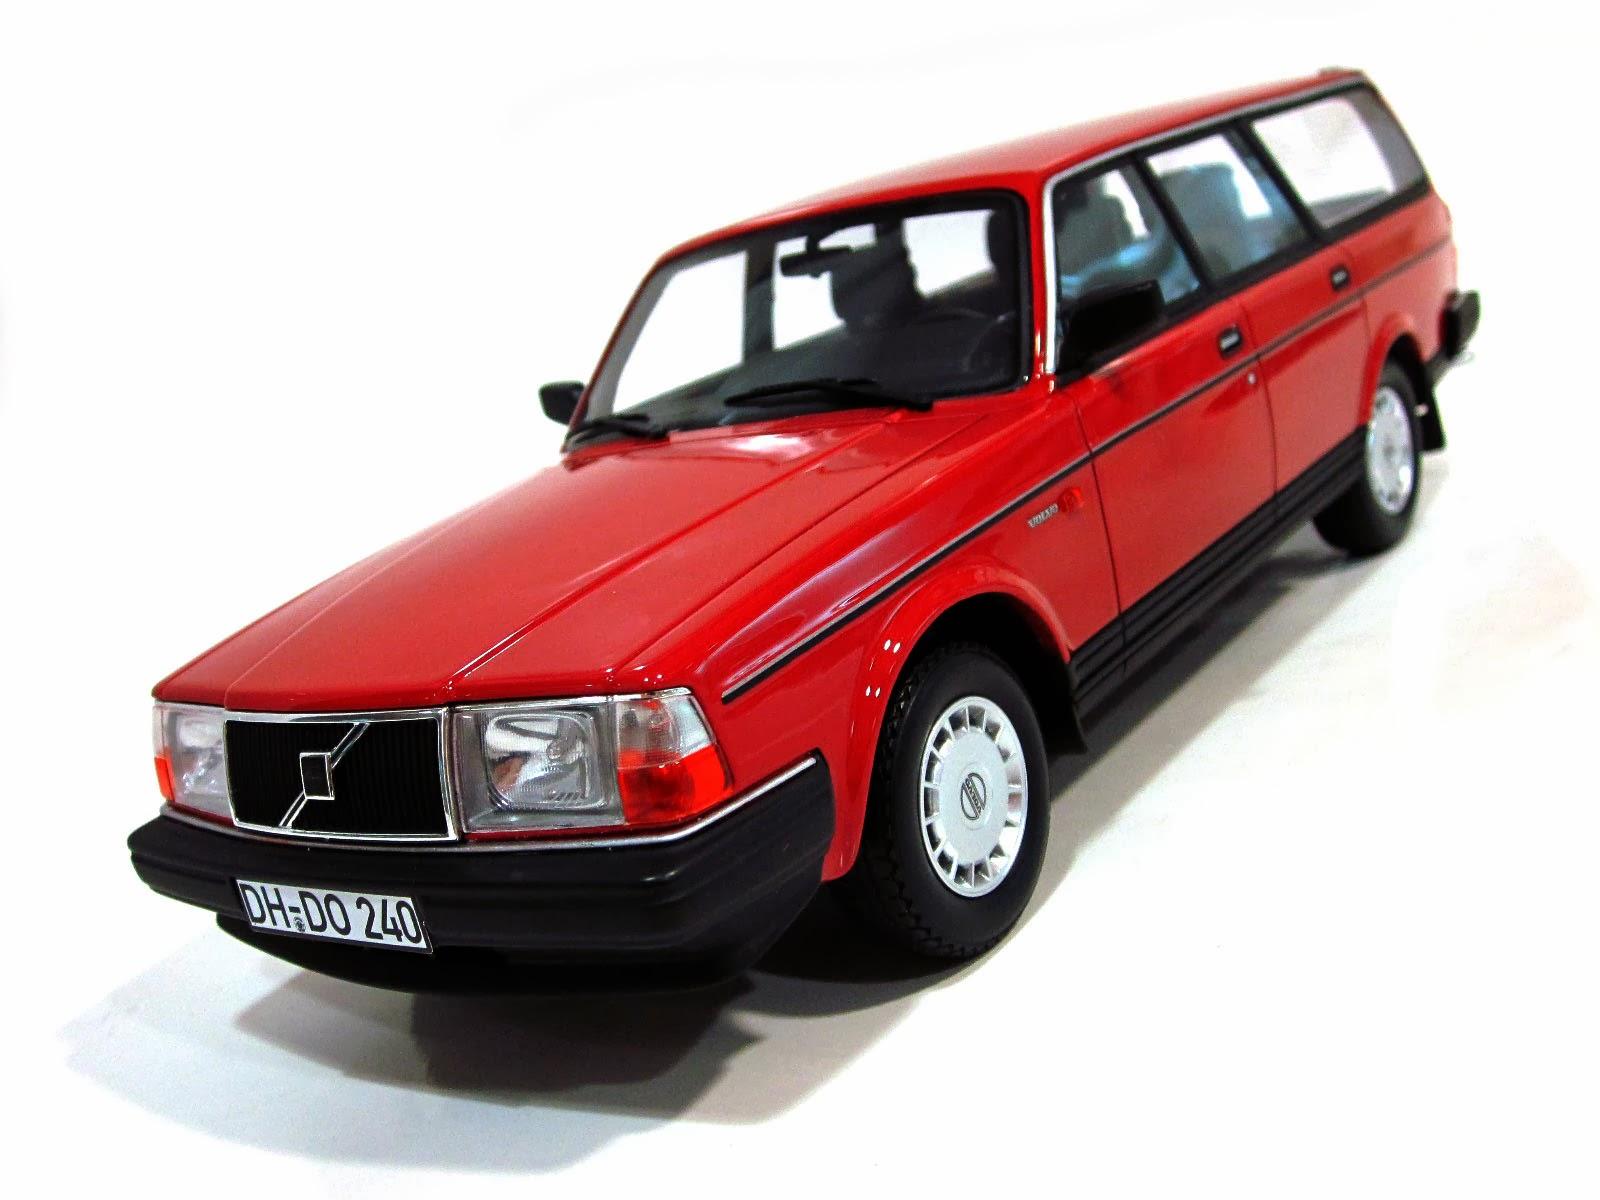 Volvo 240 GL 2.3 Estate '88 - BoS Models